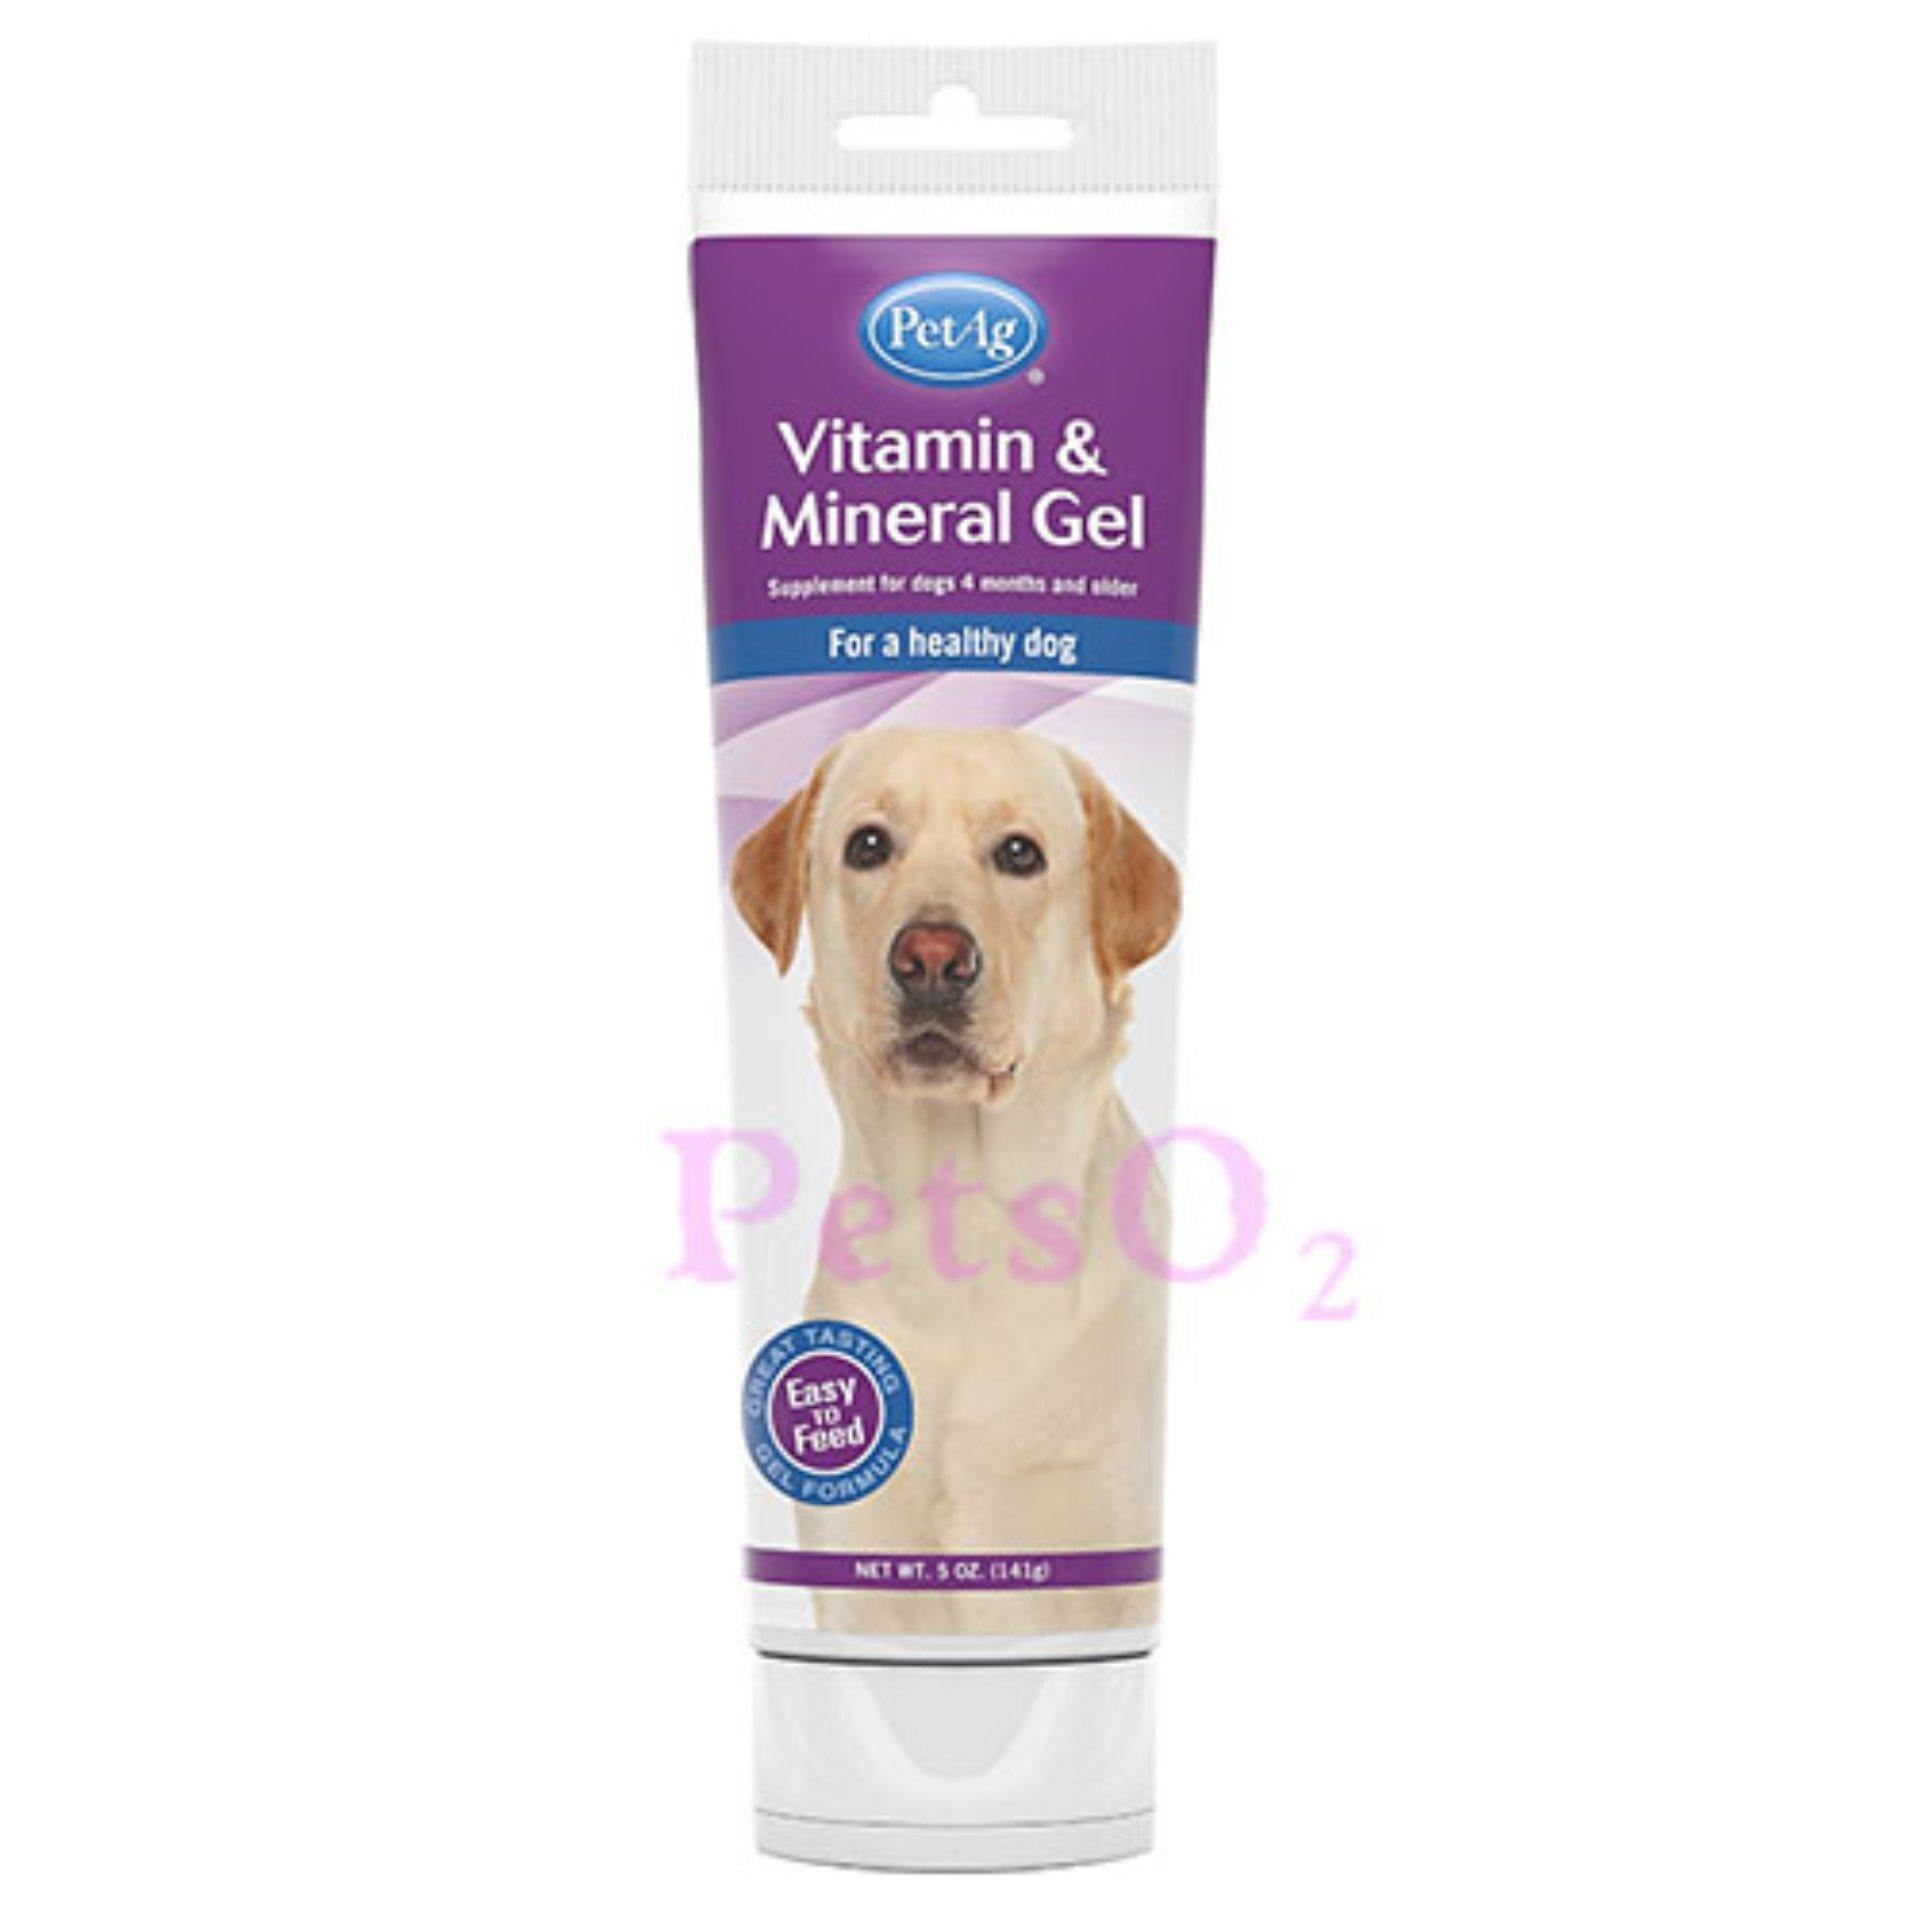 Petag Dog Vitamin Mineral Gel 141g By Petso2.